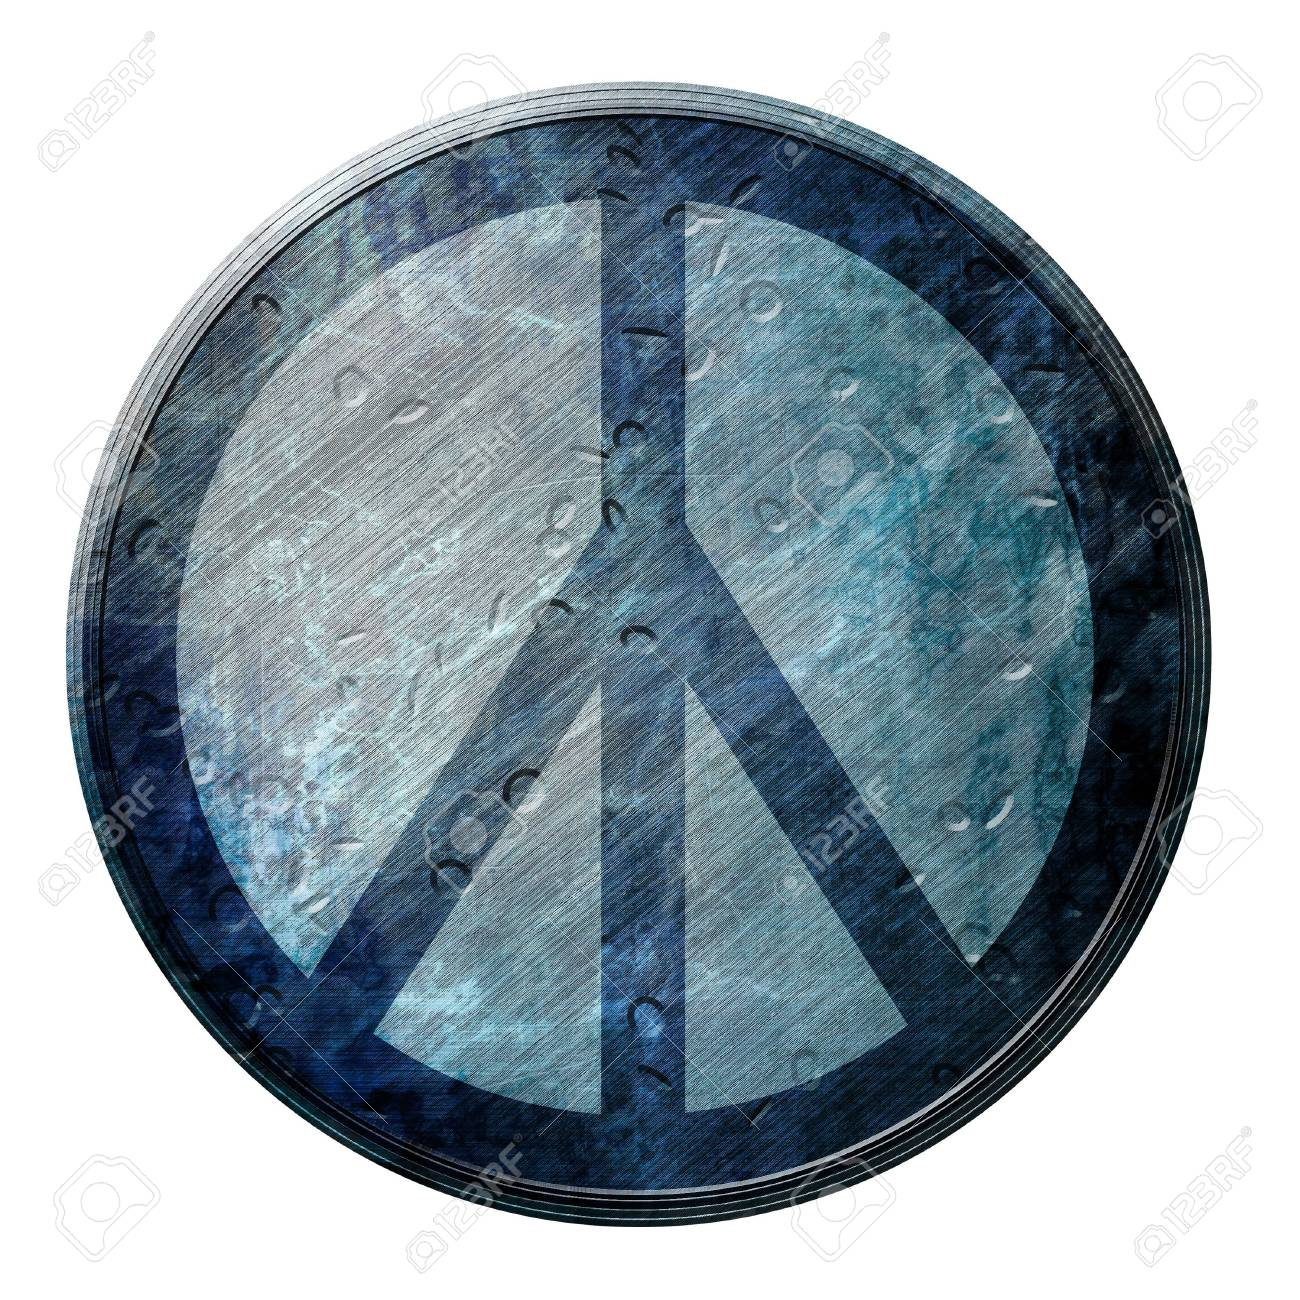 Grunge Flower Power Symbol On A White Background Stock Photo